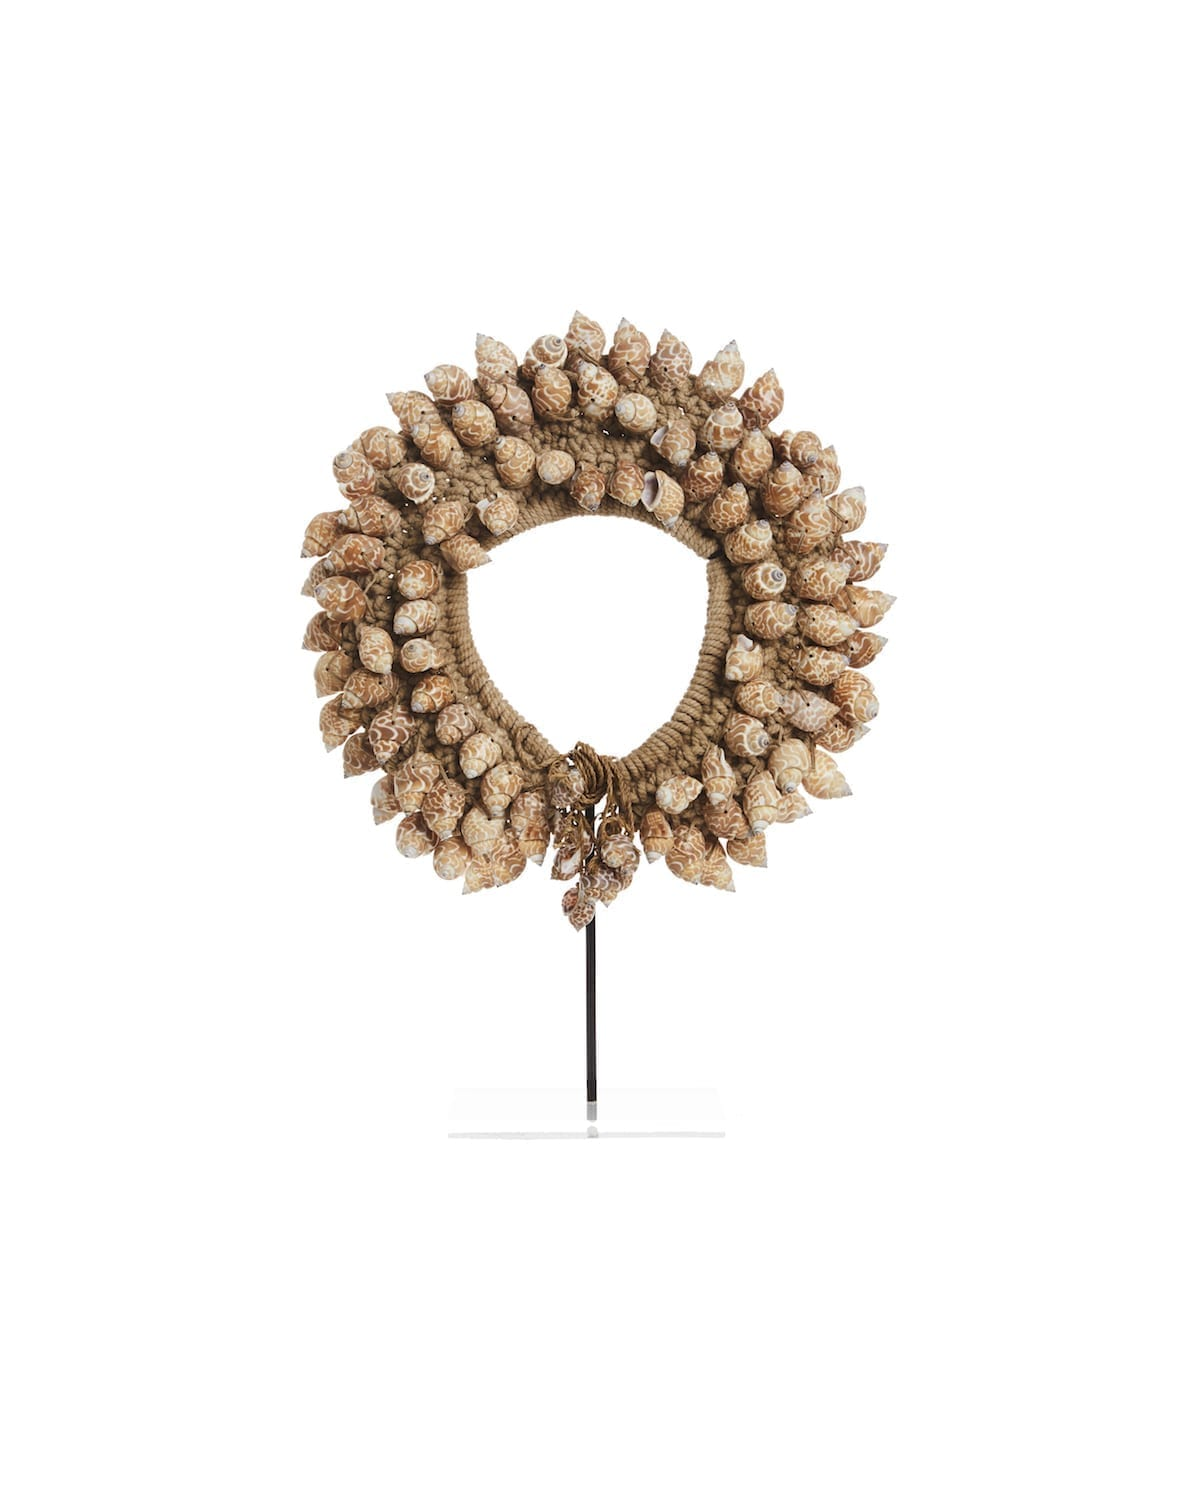 Caramel Shell Necklace